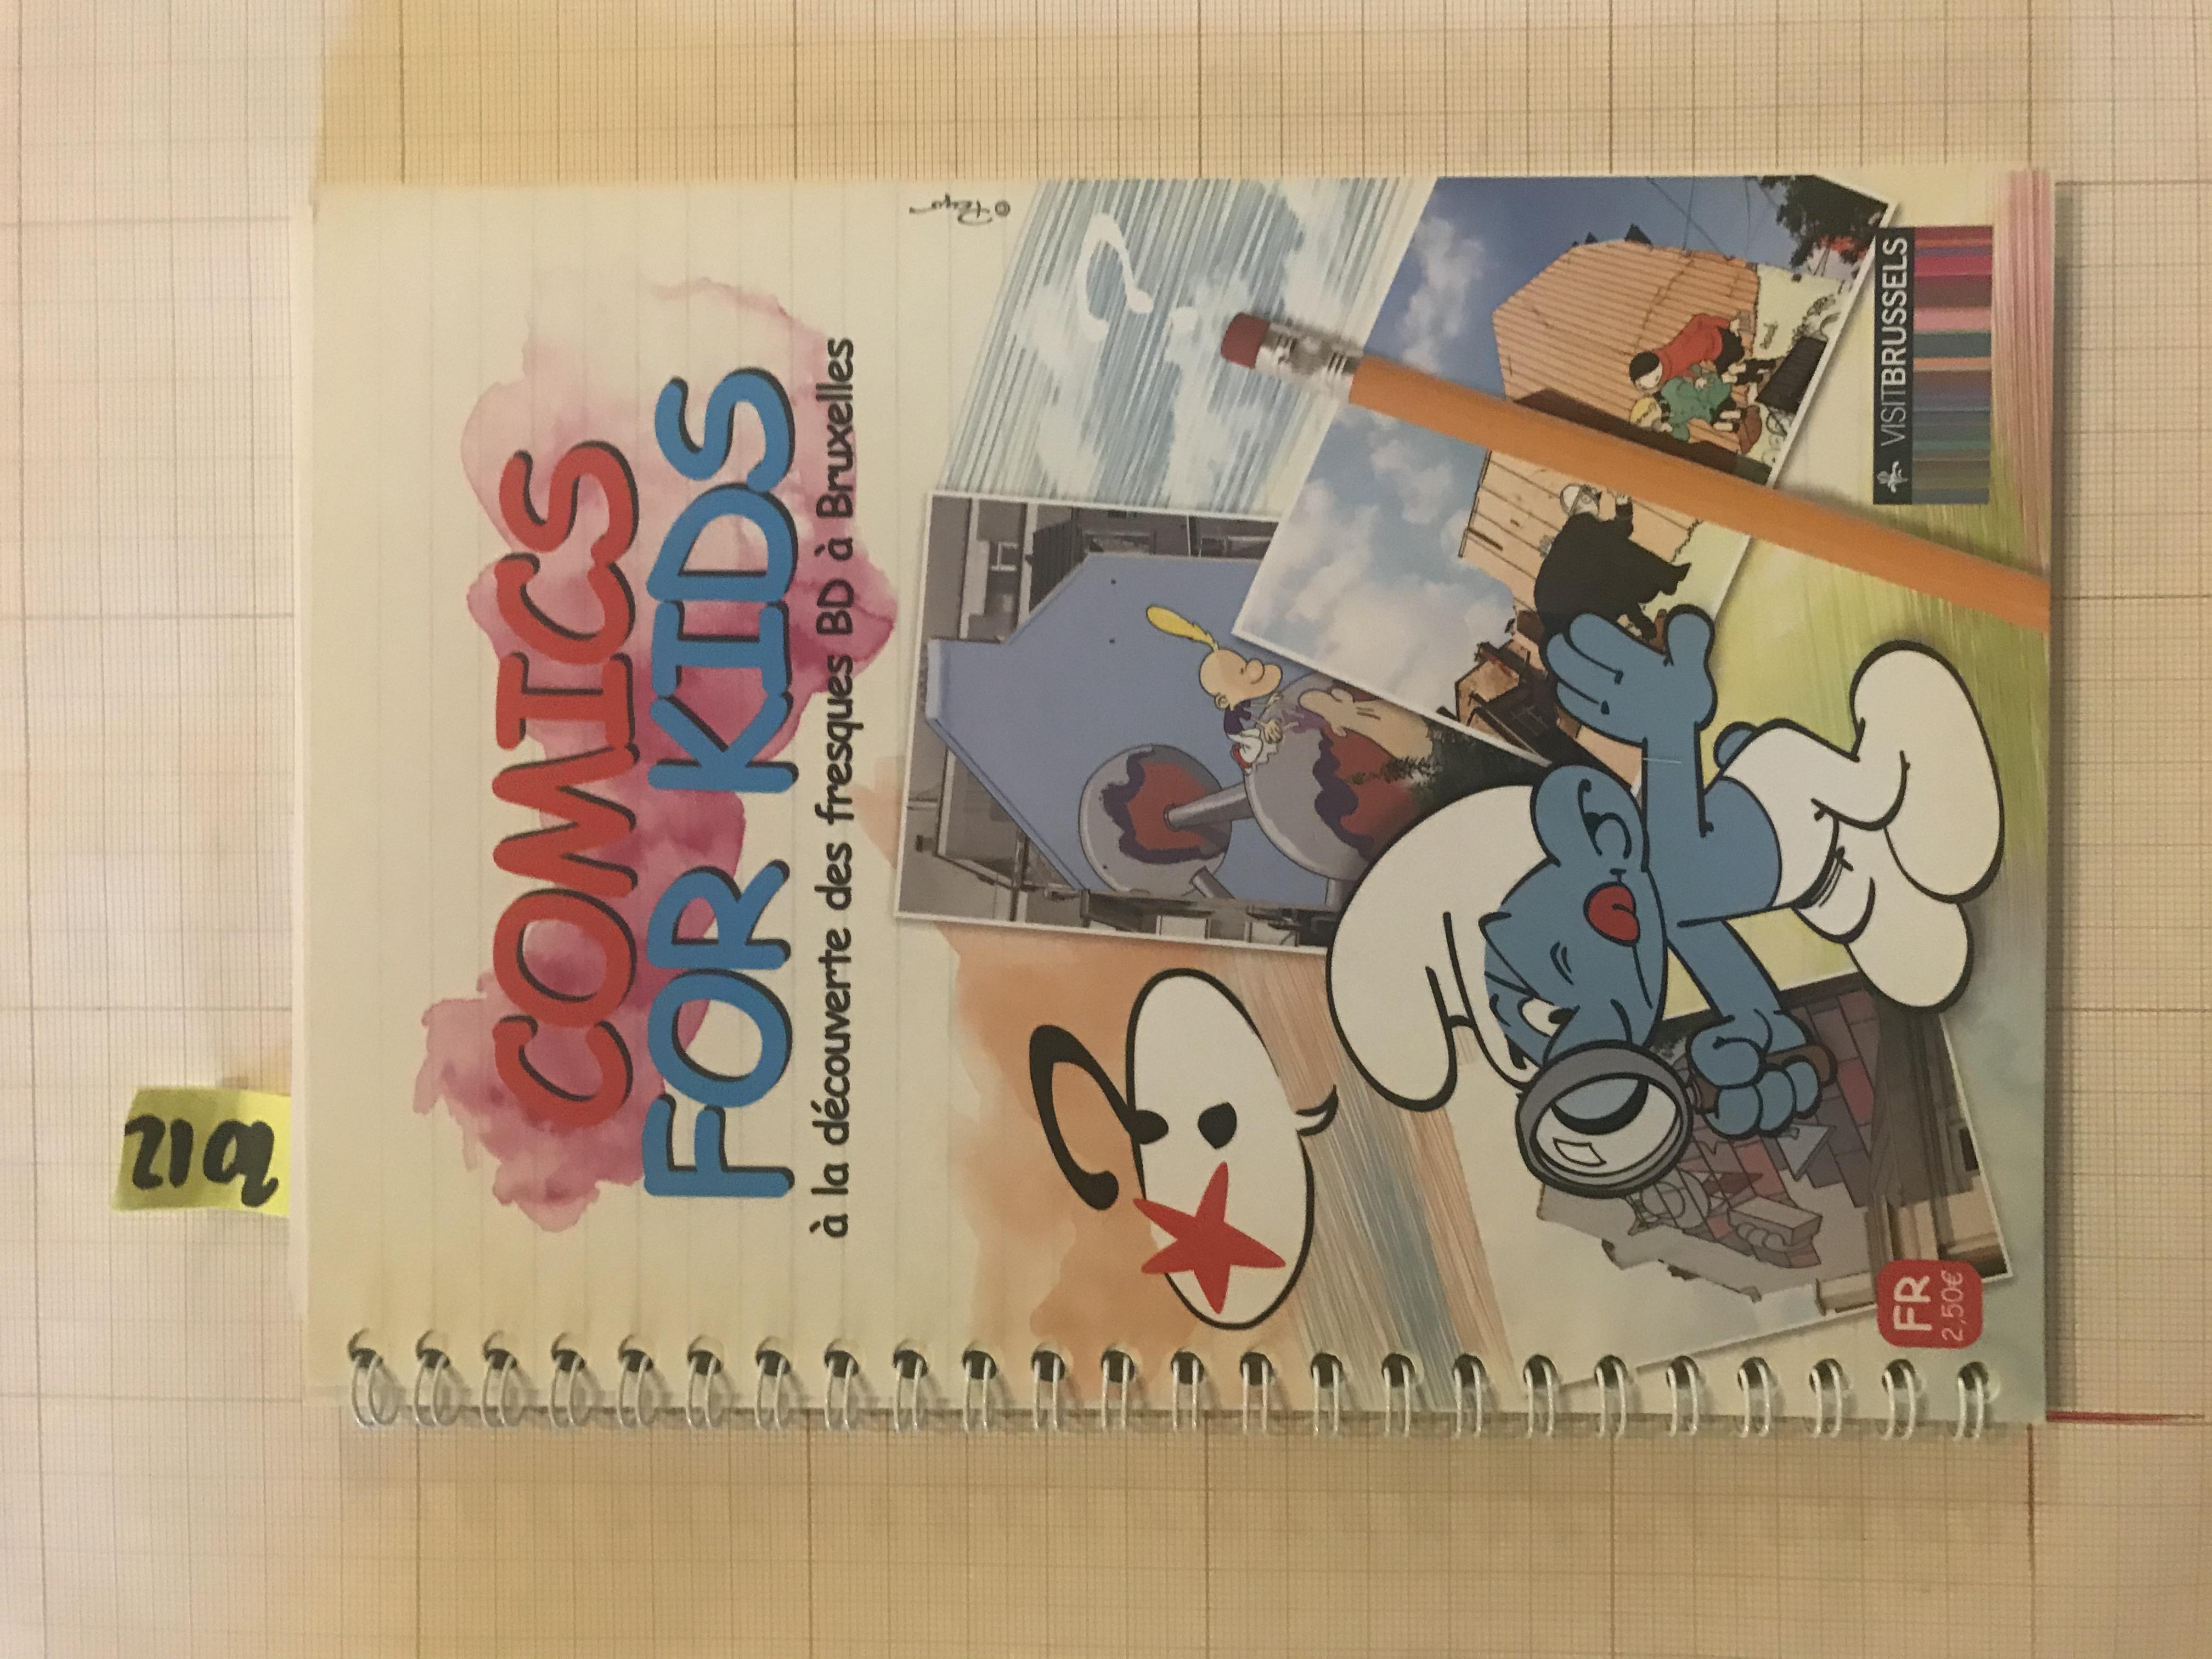 Comics for kids© François Schuiten / Visit.brussels, 2012